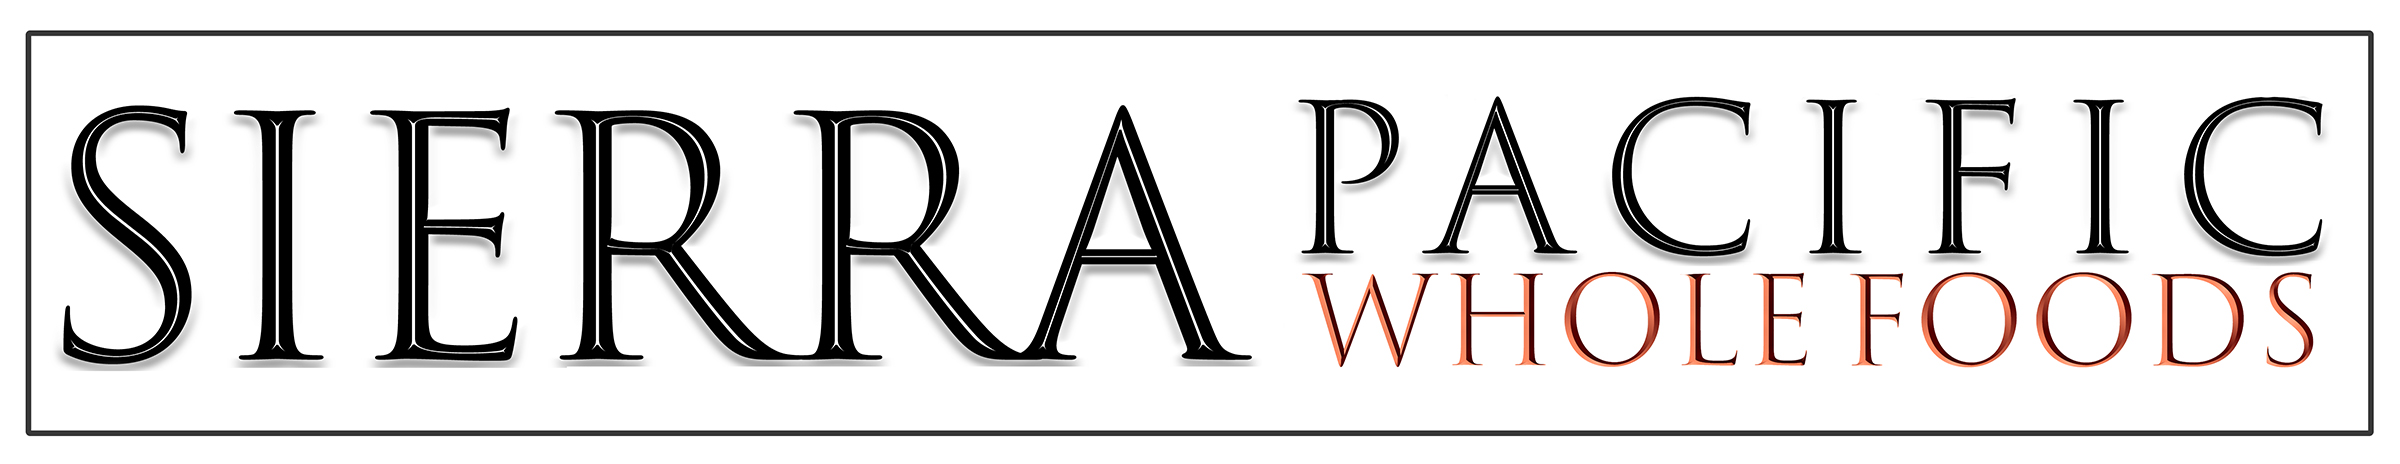 spwf_header_logo.jpg